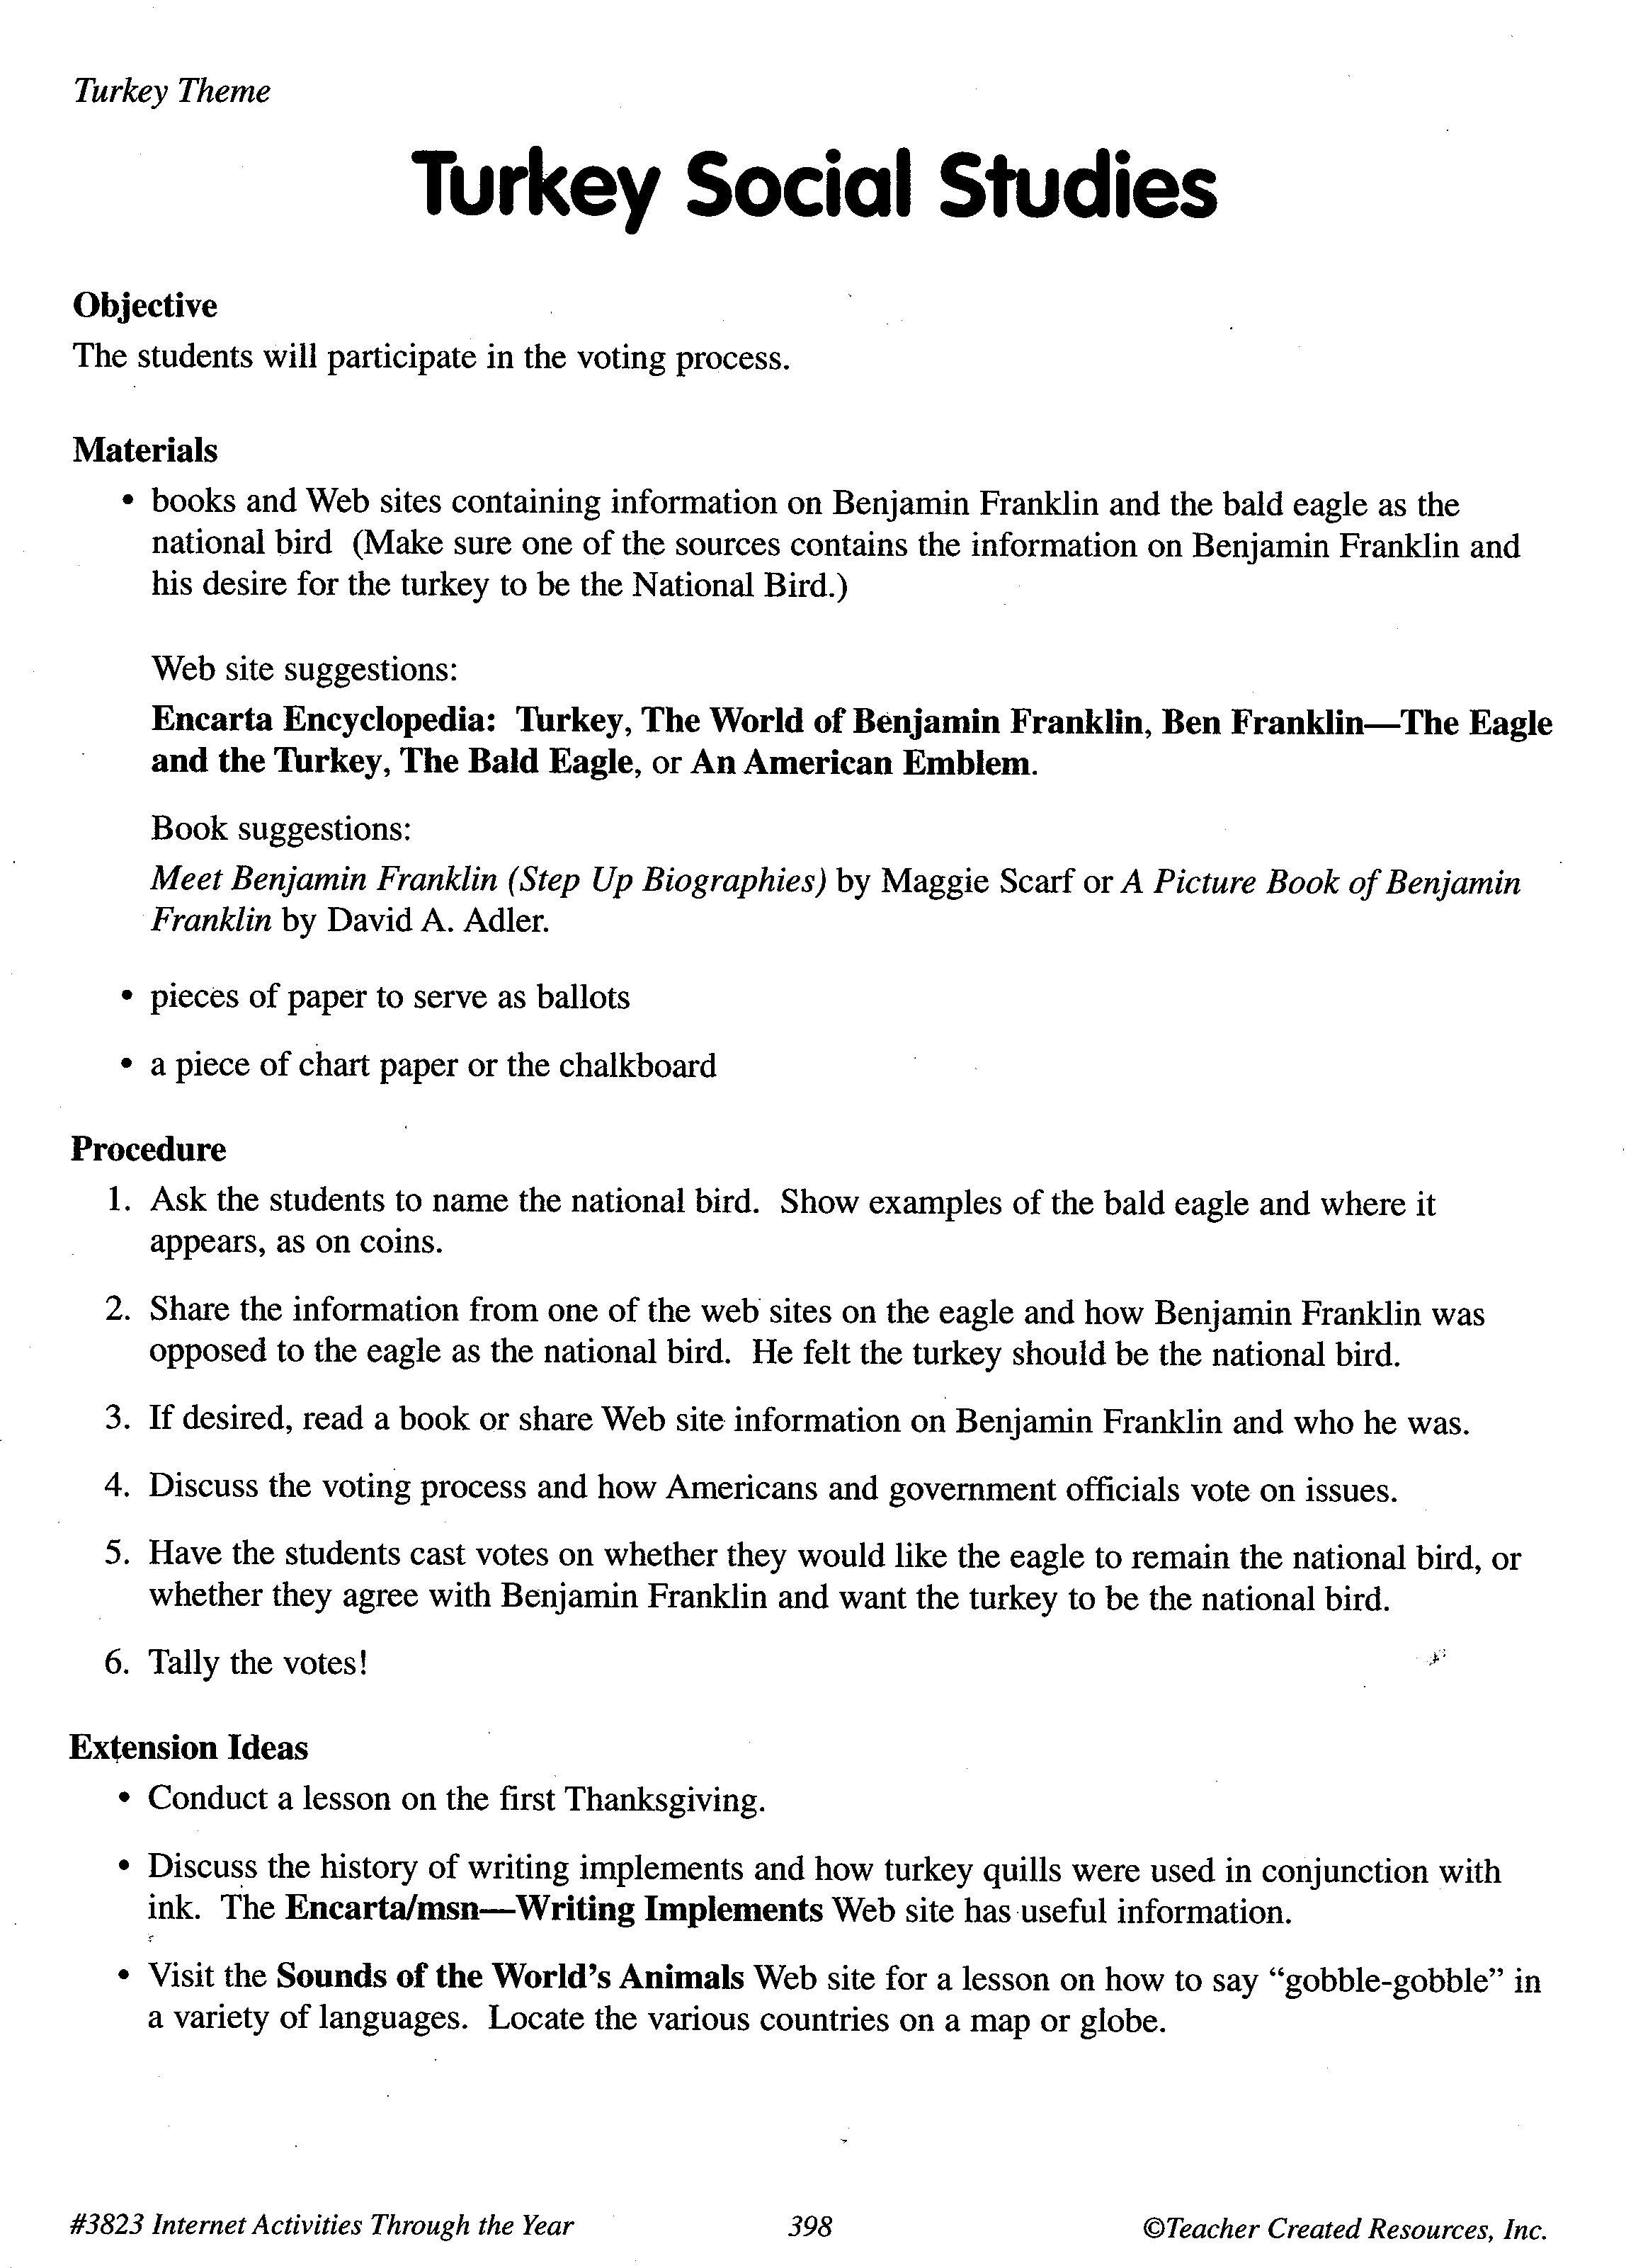 Thanksgiving Social Studies Lesson Social Studies Lesson Plans Social Studies Social studies lesson plan template